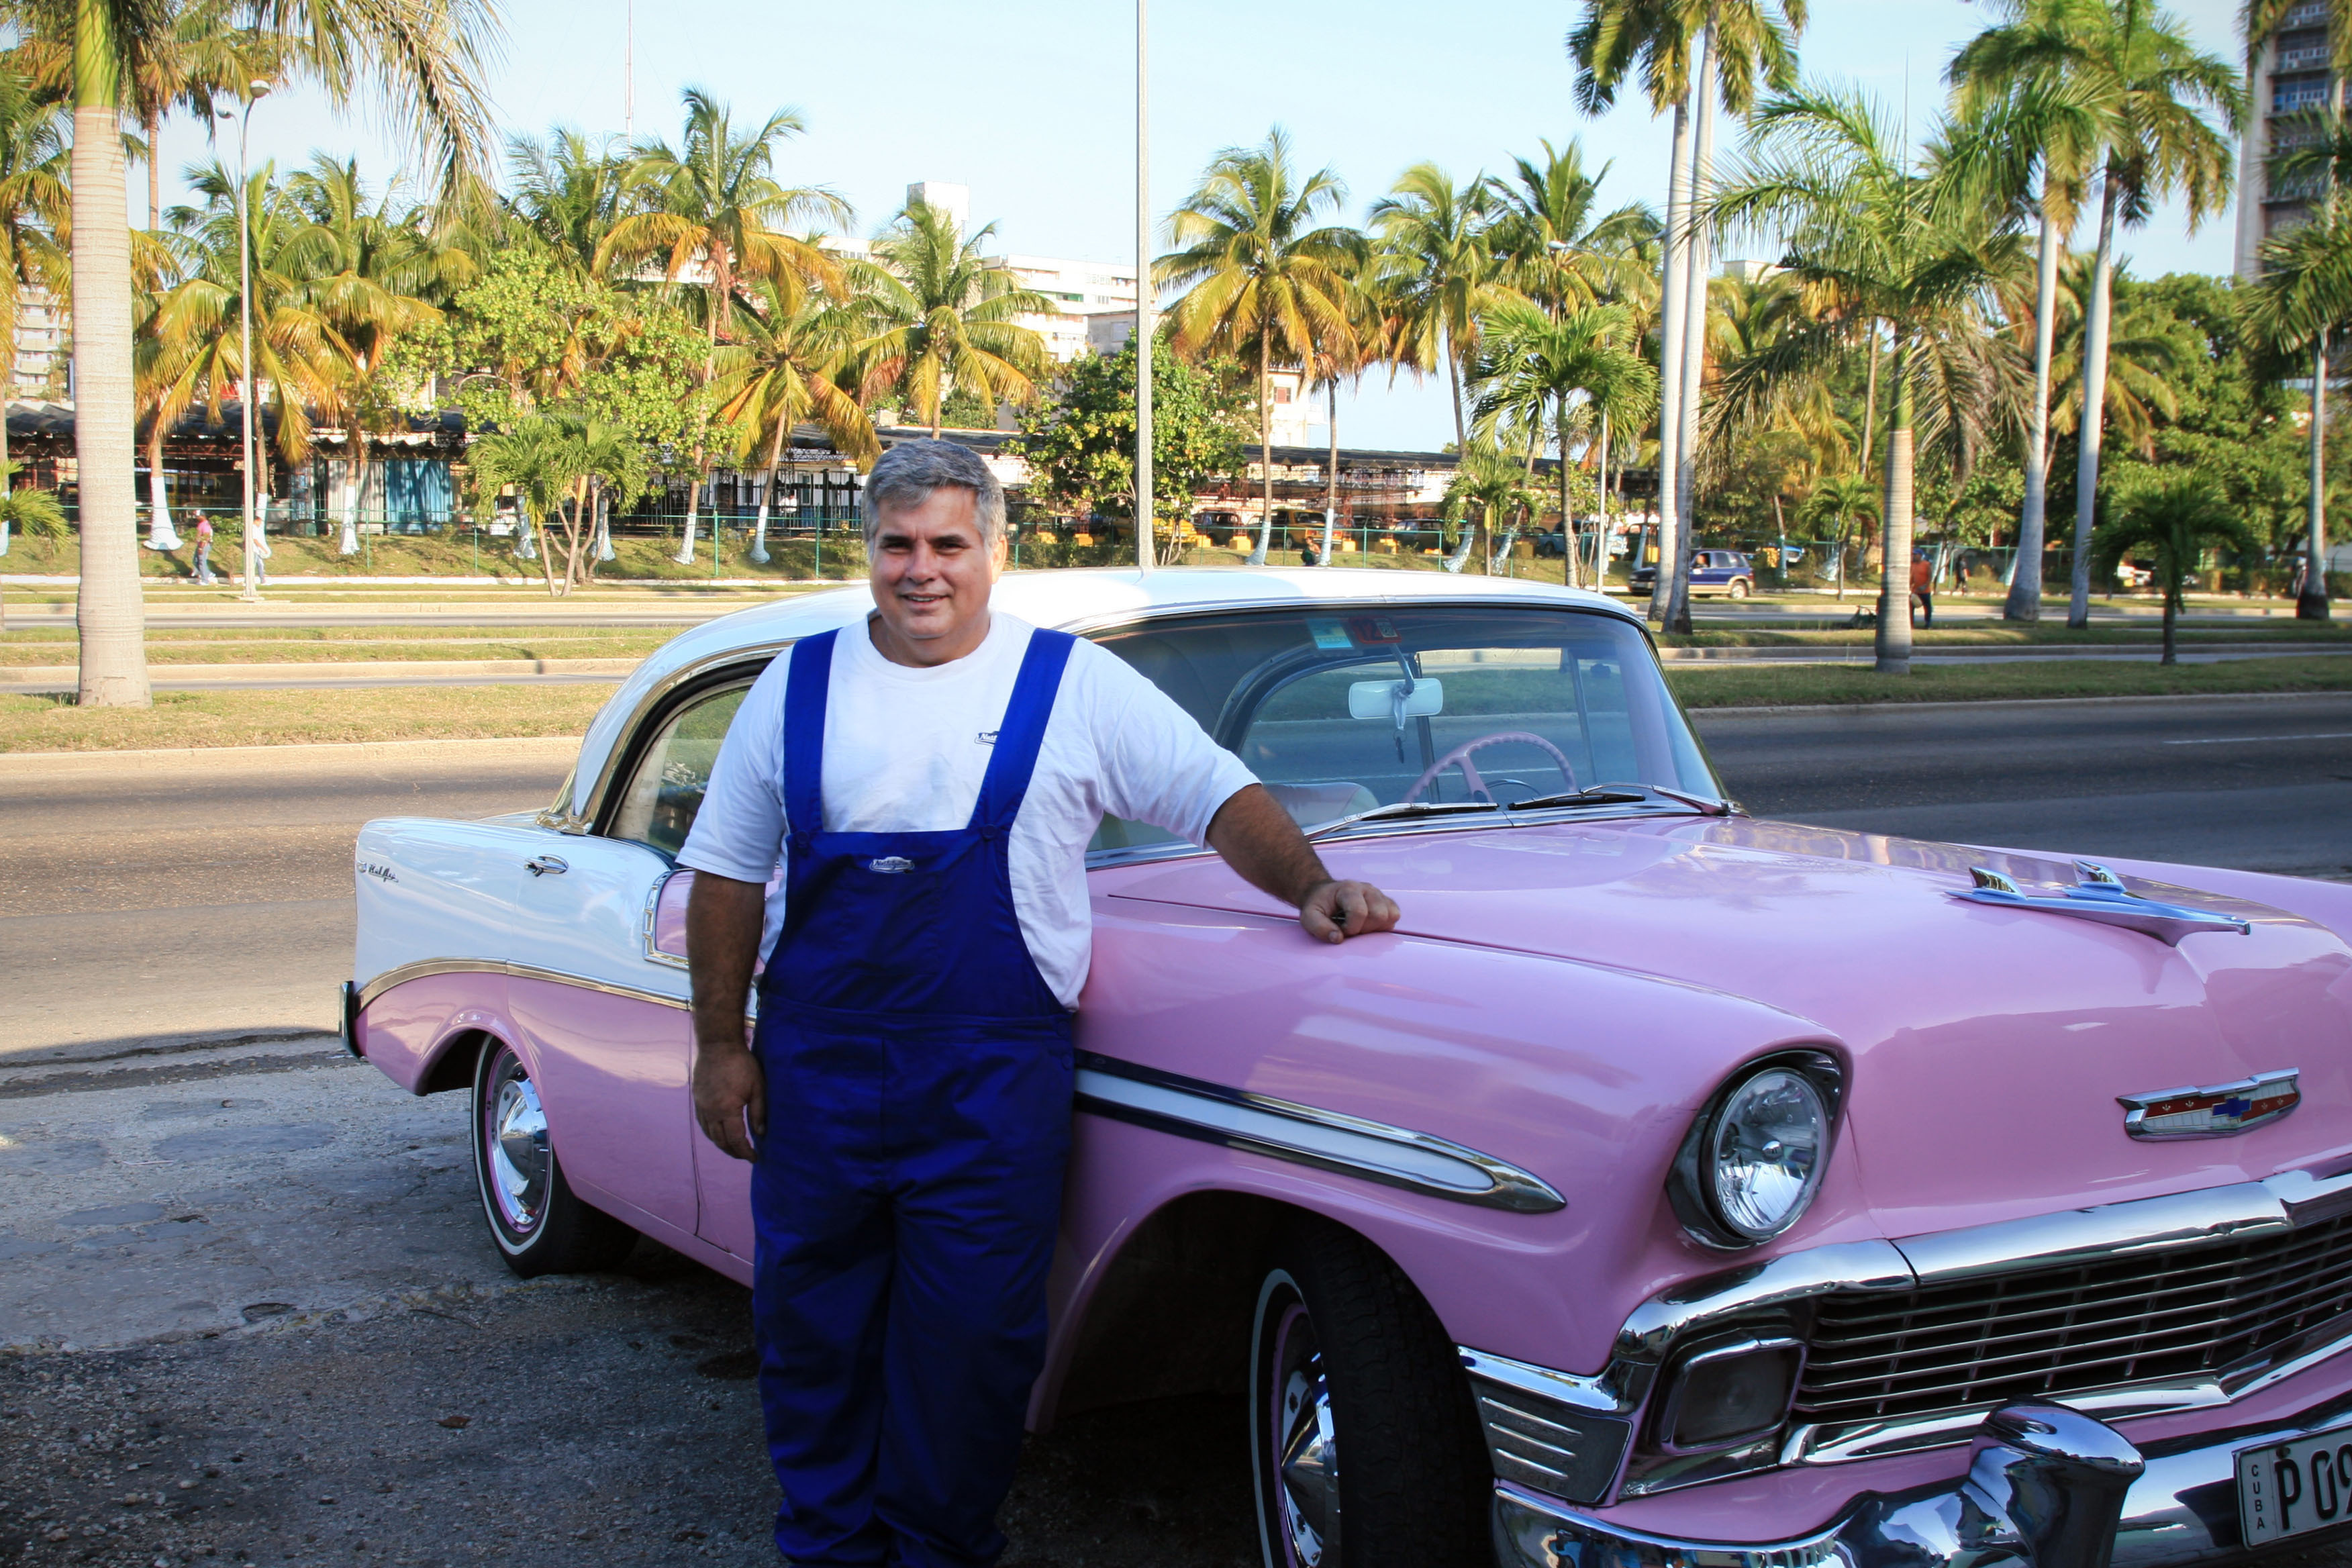 Nostalgic Cars: Sour Automotive Fruit Of Cuban Embargo Gets New Life